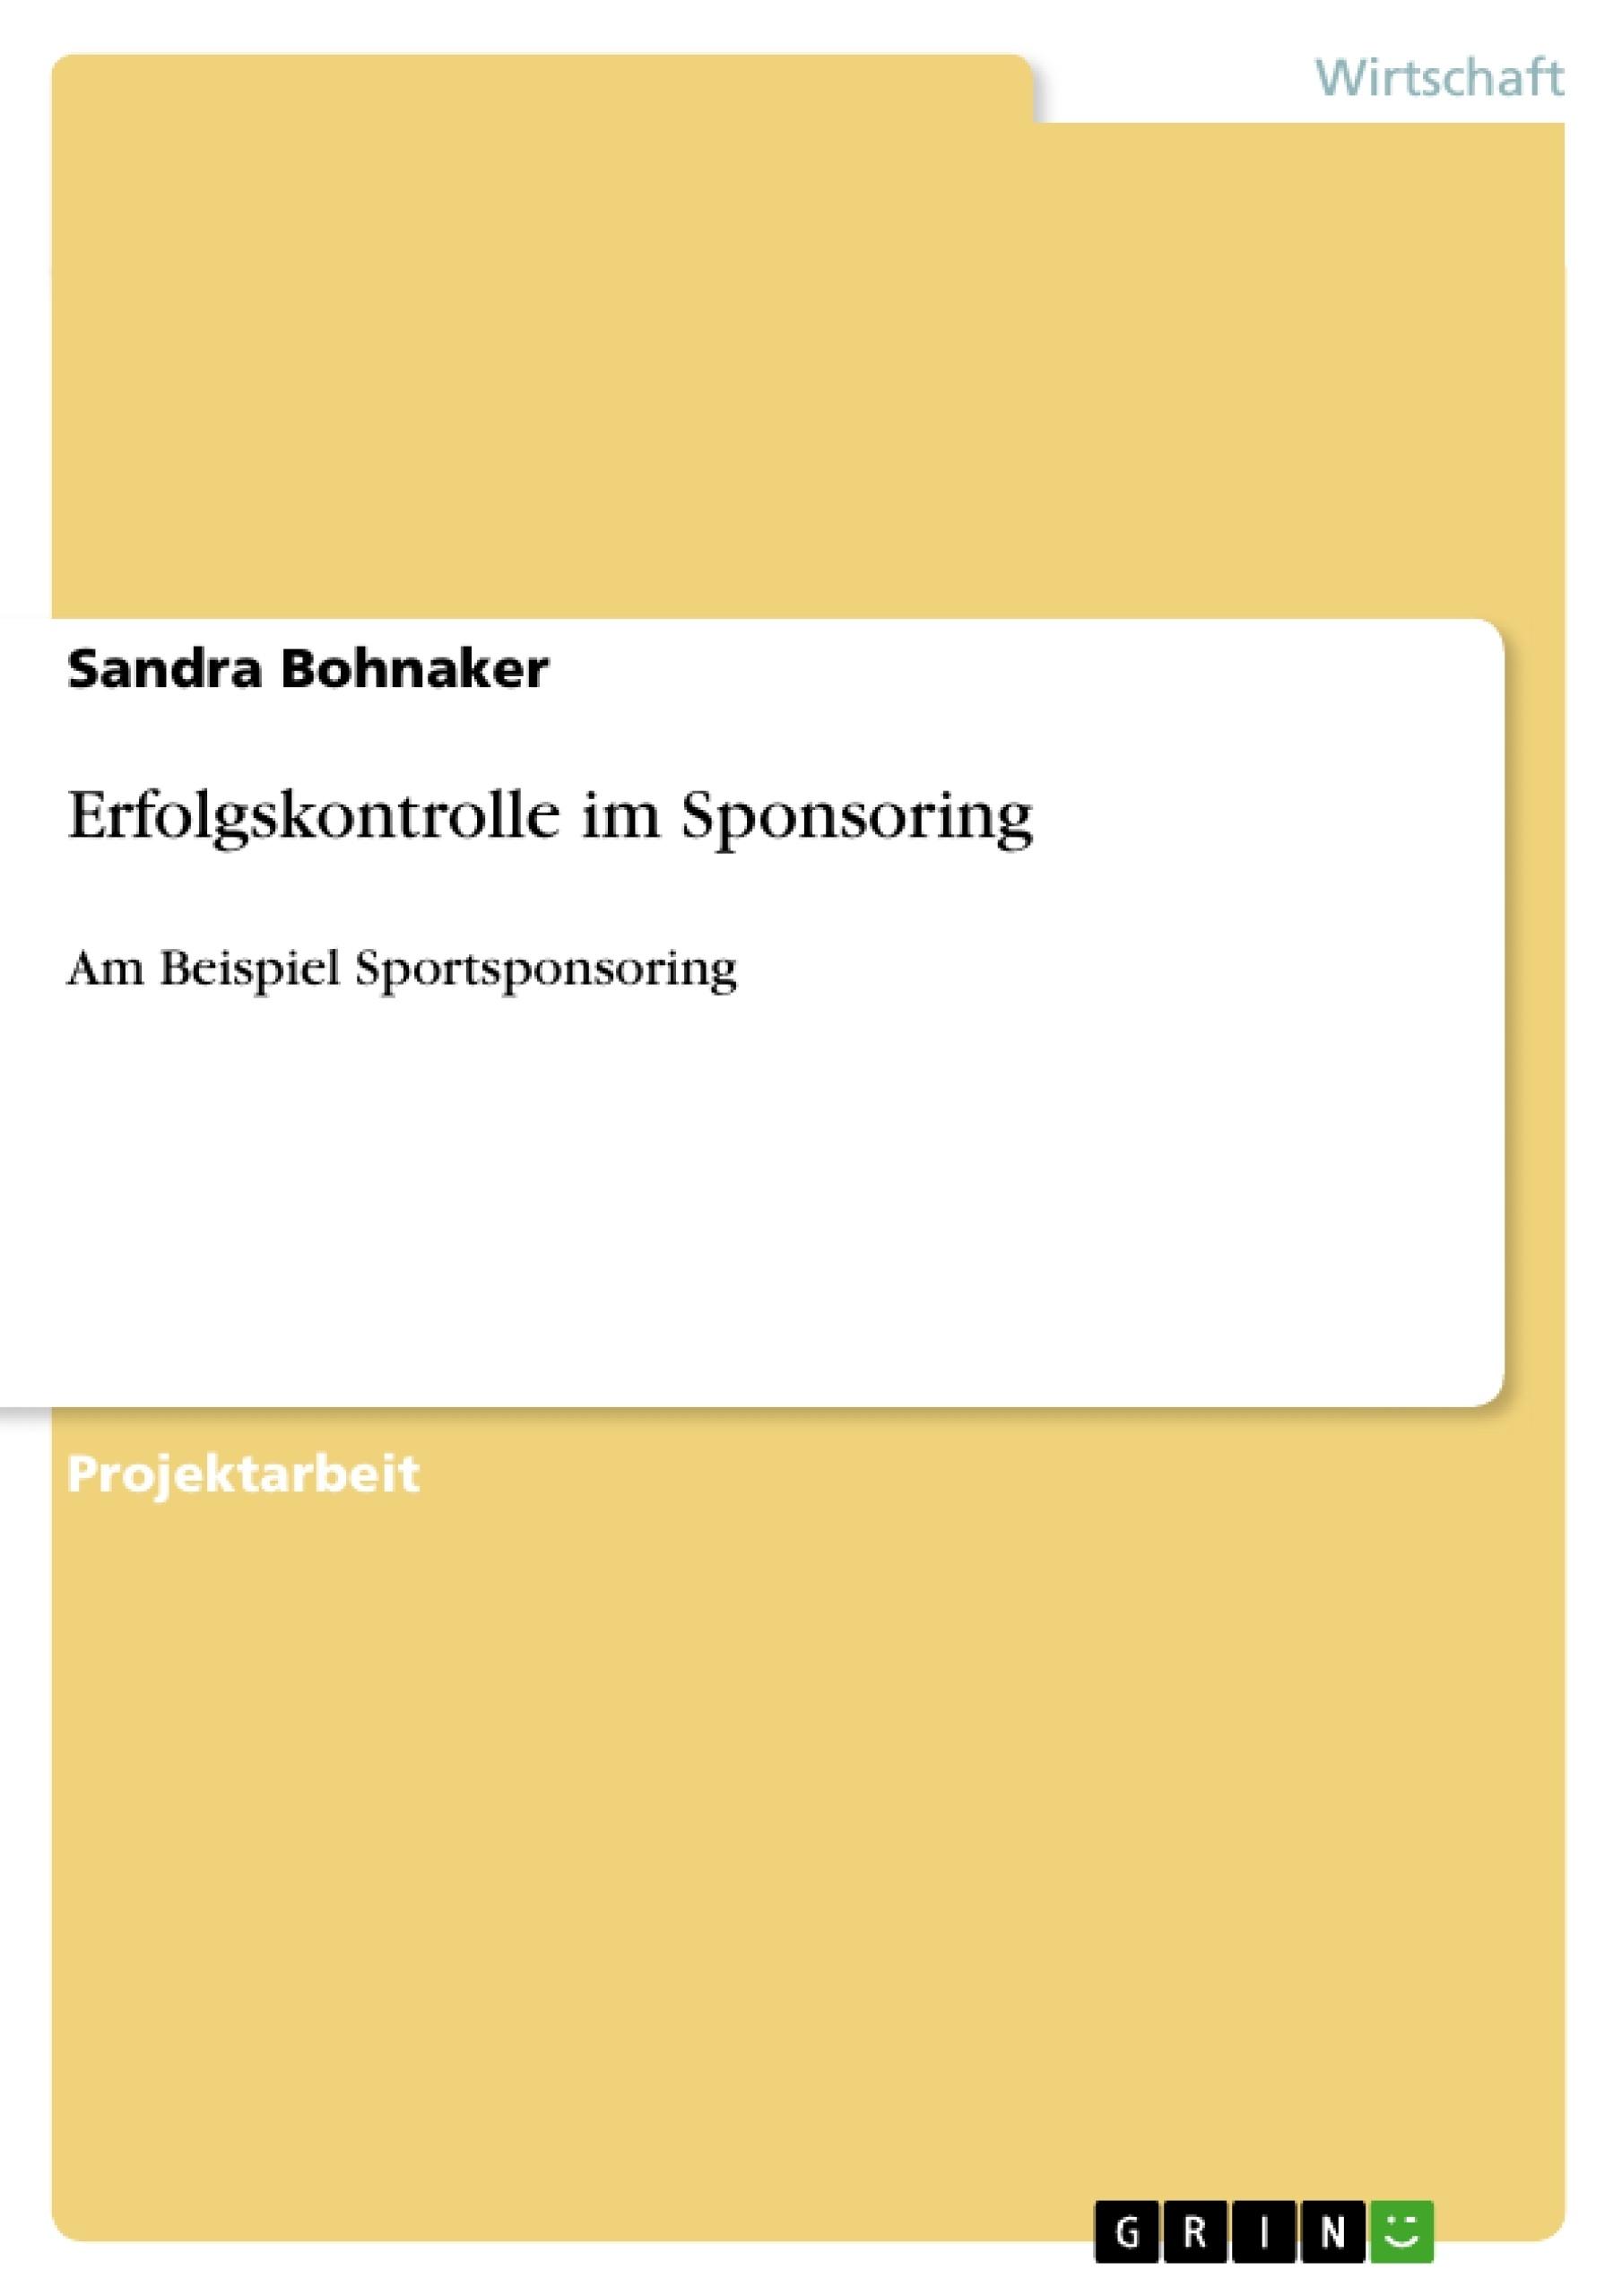 Titel: Erfolgskontrolle im Sponsoring